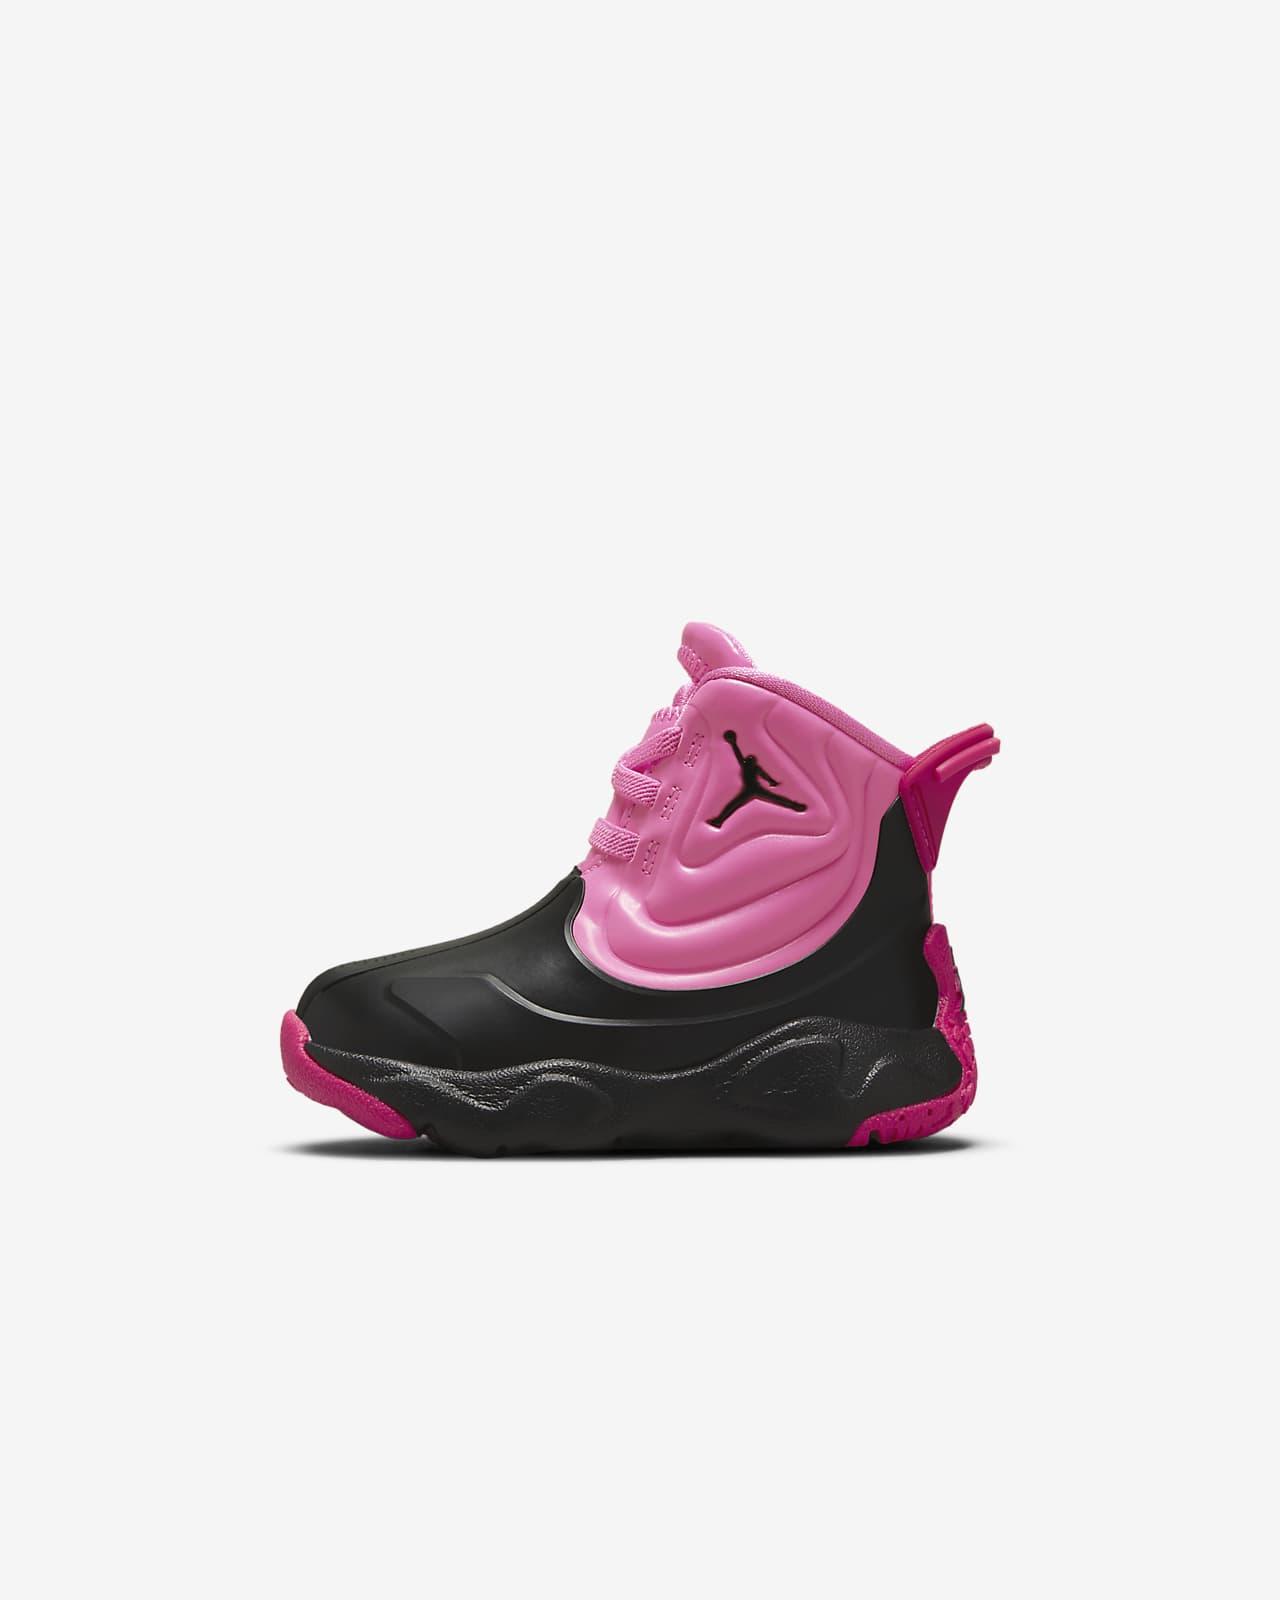 Jordan Drip 23 Baby/Toddler Rain Boots